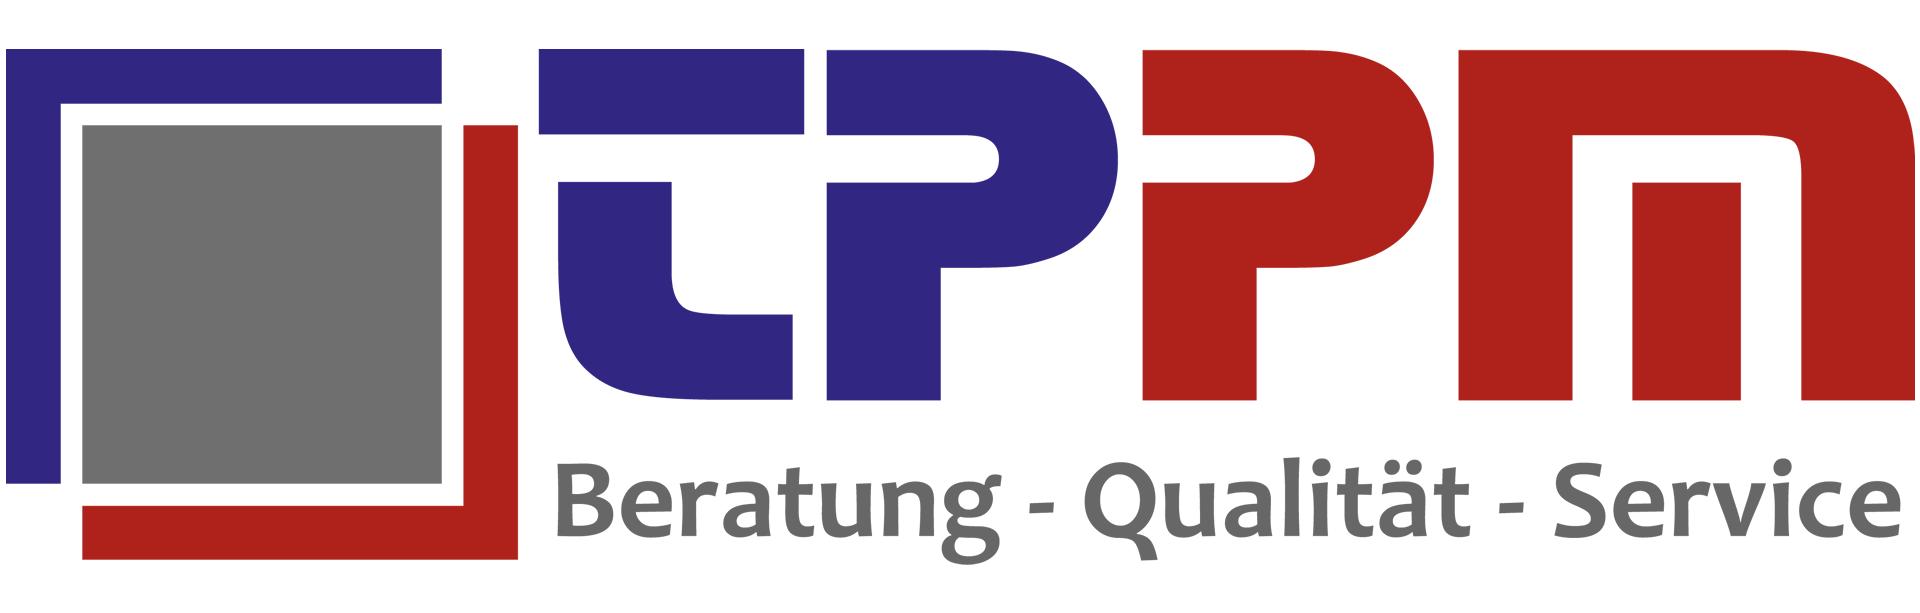 TPPM GmbH - Detmold